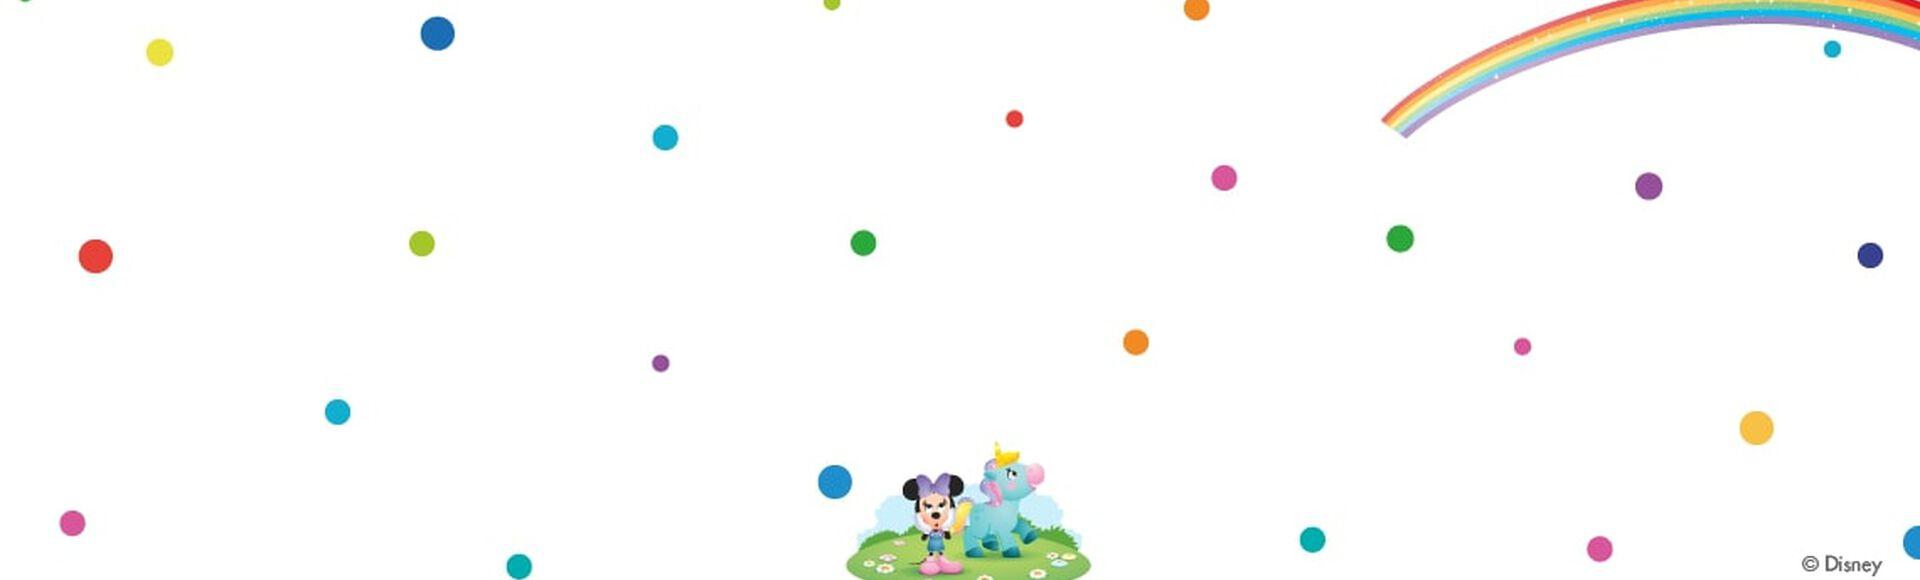 Minnie Mouse y Lily el unicornio